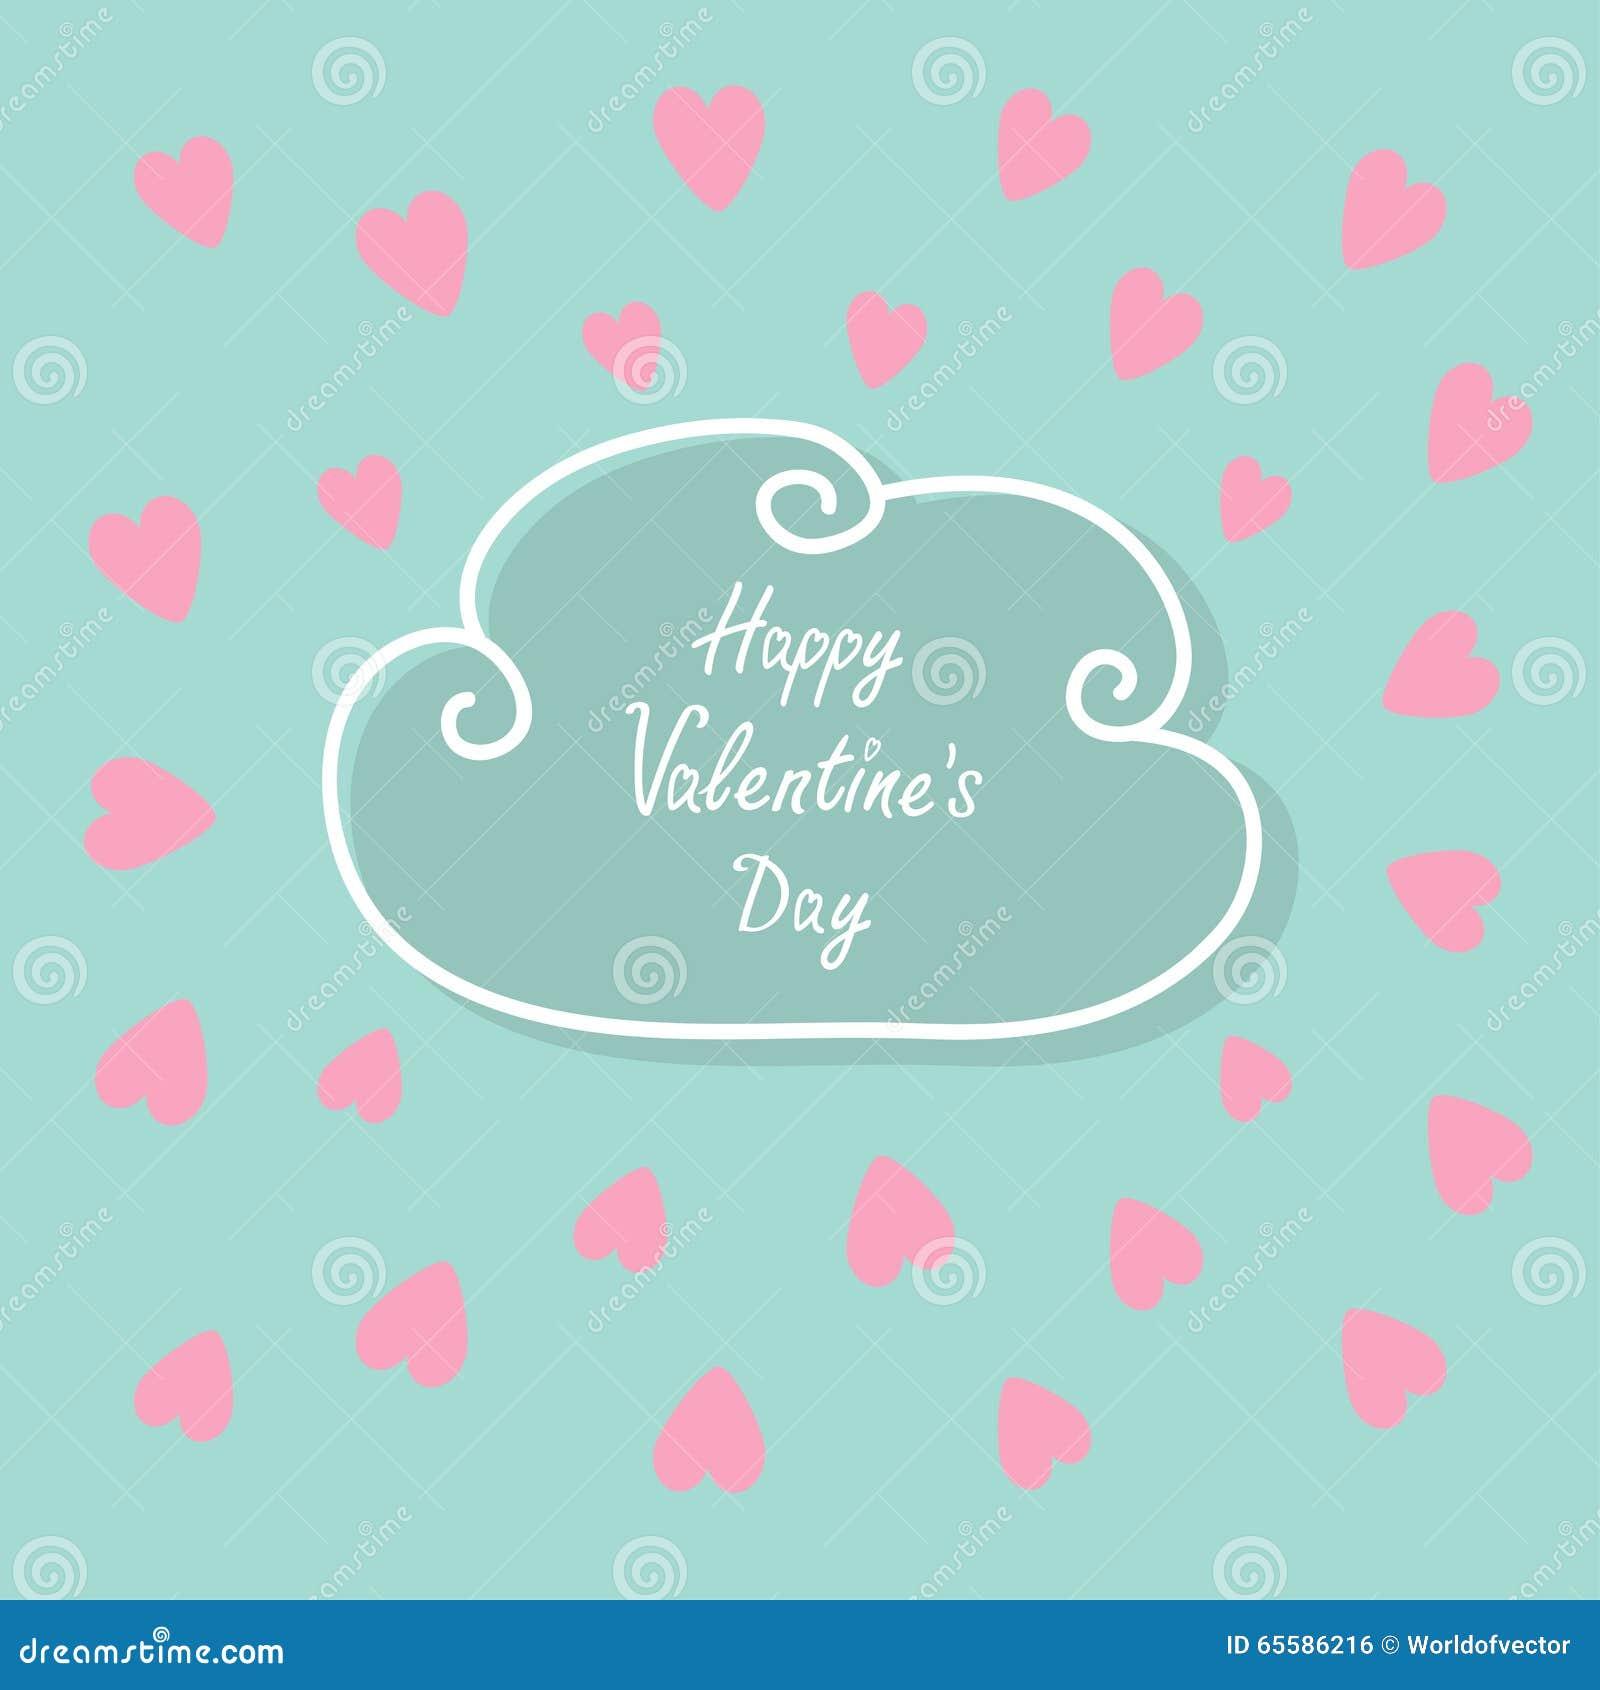 Happy Valentines Day. Love card. Cloud contour line frame. Heart set. Flat design Pink, blue color background